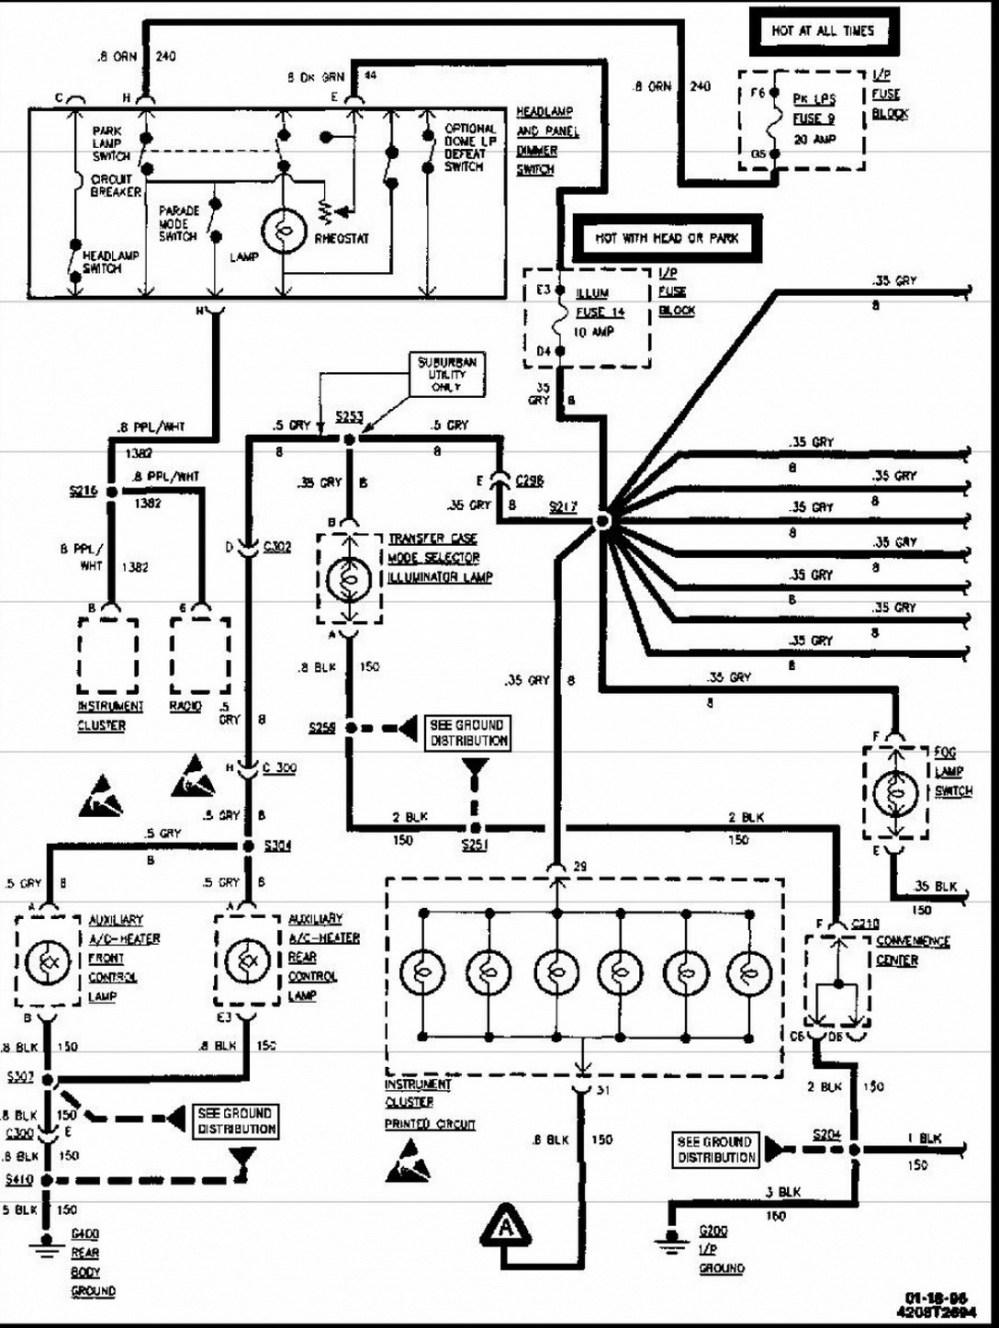 medium resolution of 93 corvette radio wiring diagram 1968 corvette am fm radio wiring 93 corvette engine diagram 1997